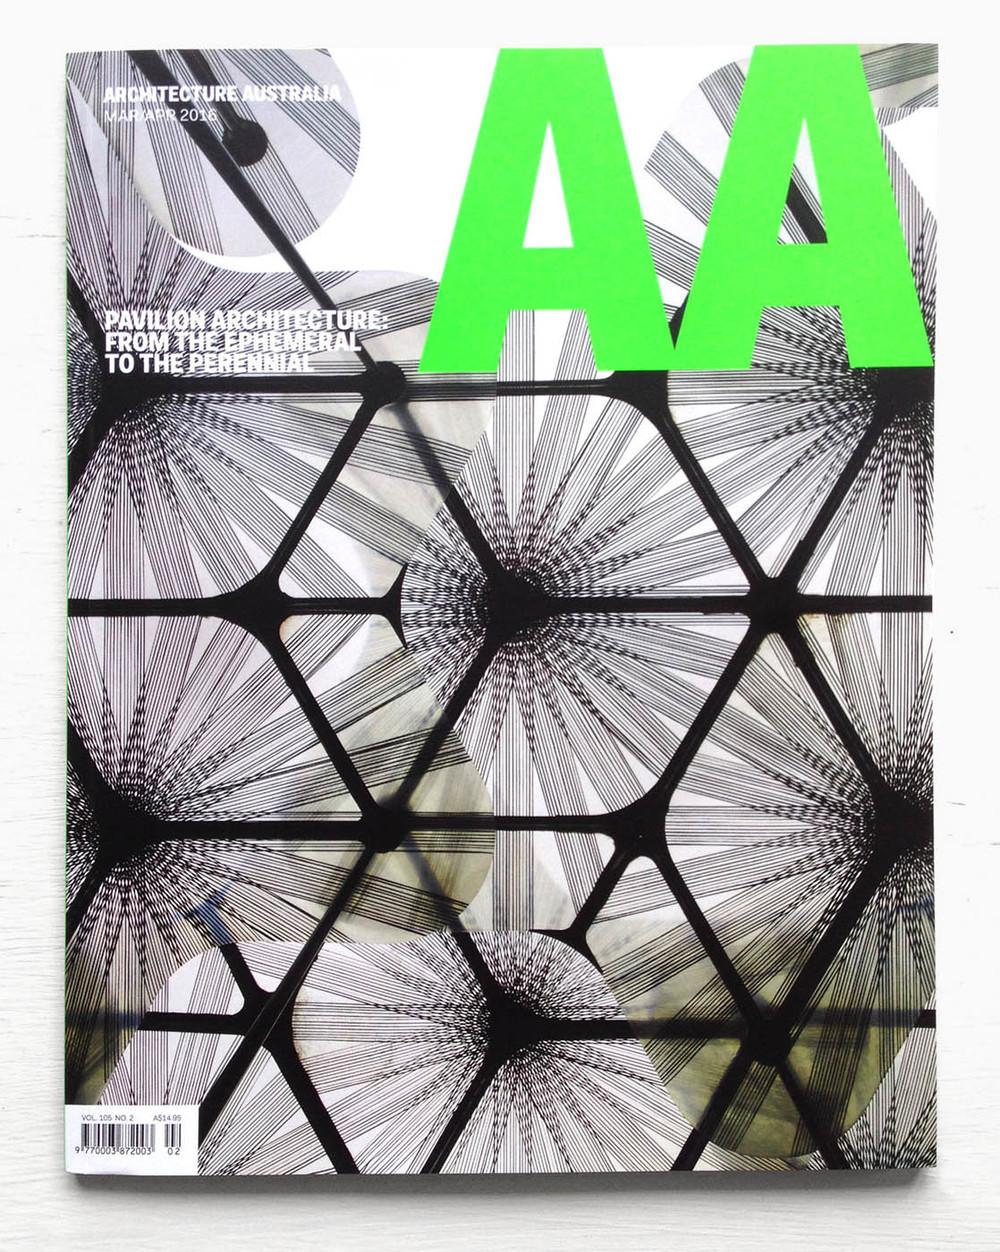 studioplusthree architecture australia cover